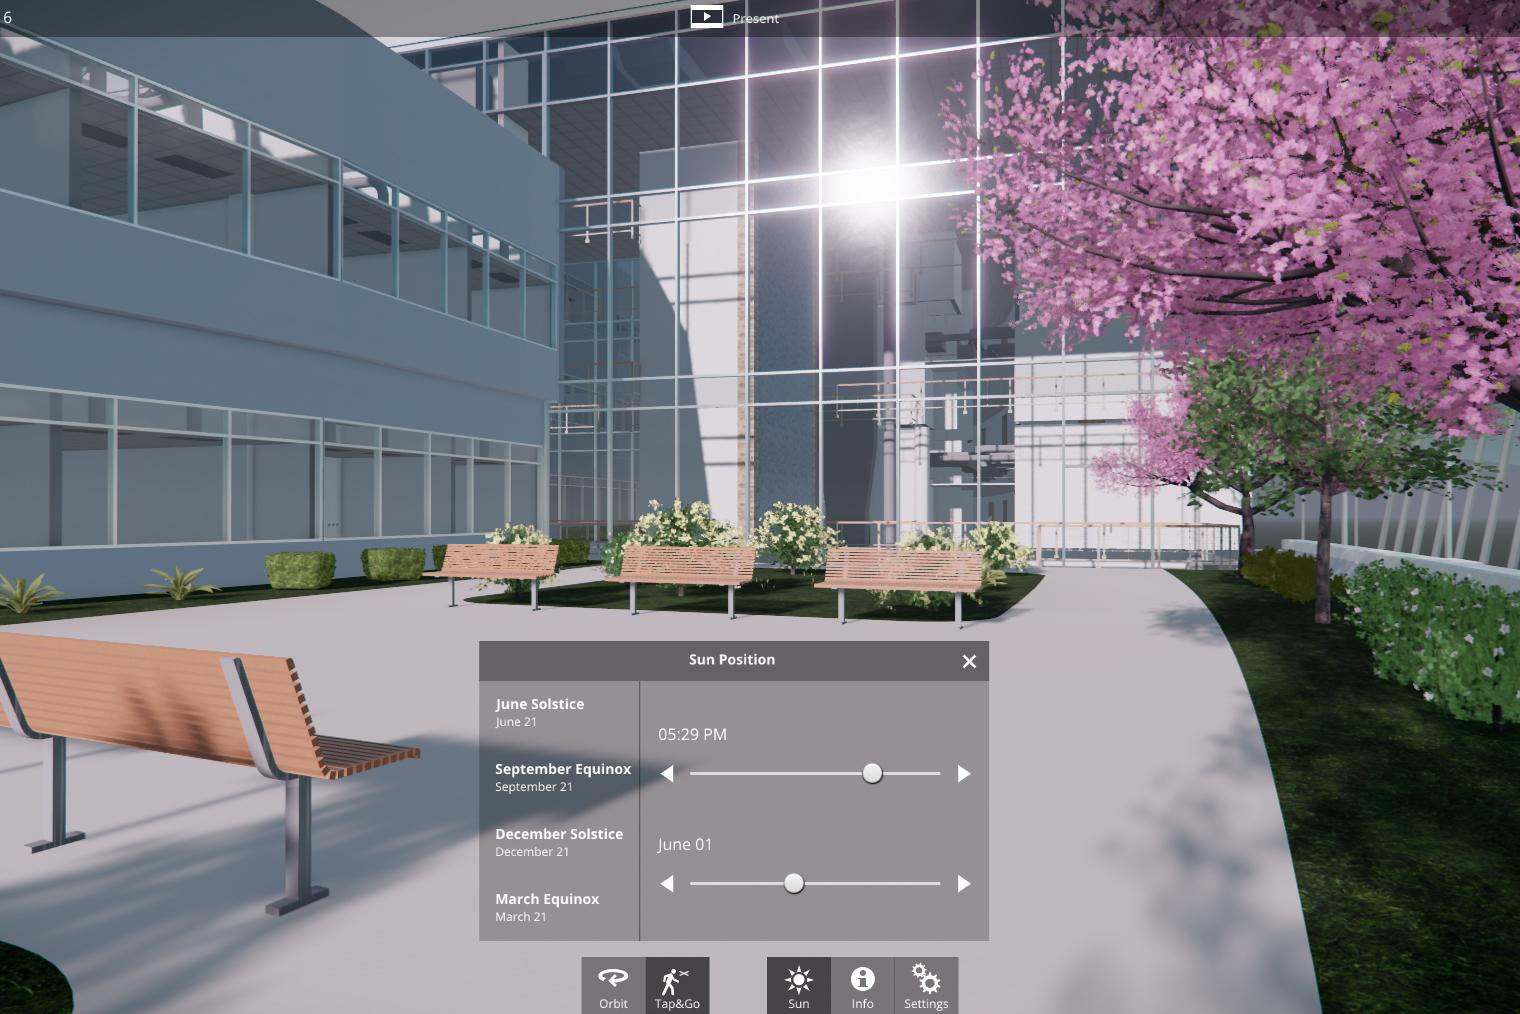 Autodesk Live Turns Revit Models into Interactive 3D